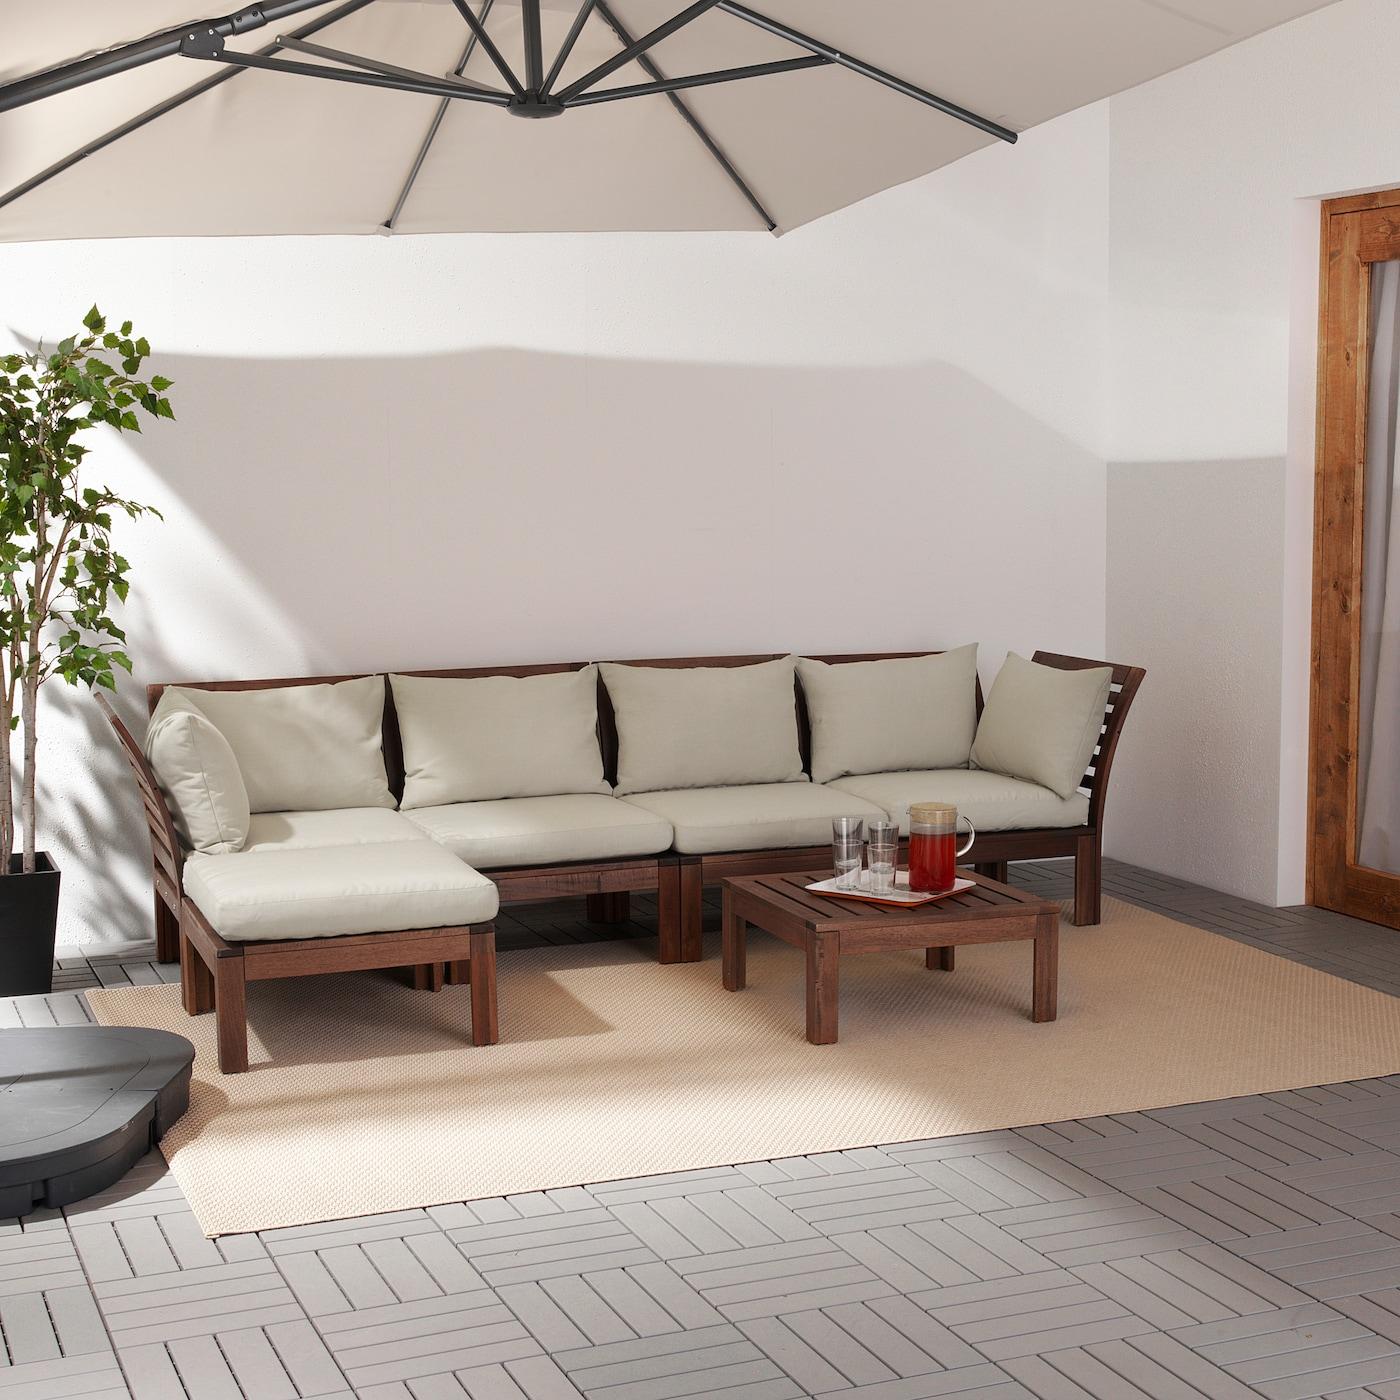 ÄPPLARÖ 4-seat modular sofa, outdoor with footstool brown stained/Hållö beige 80 cm 73 cm 286 cm 143 cm 36 cm